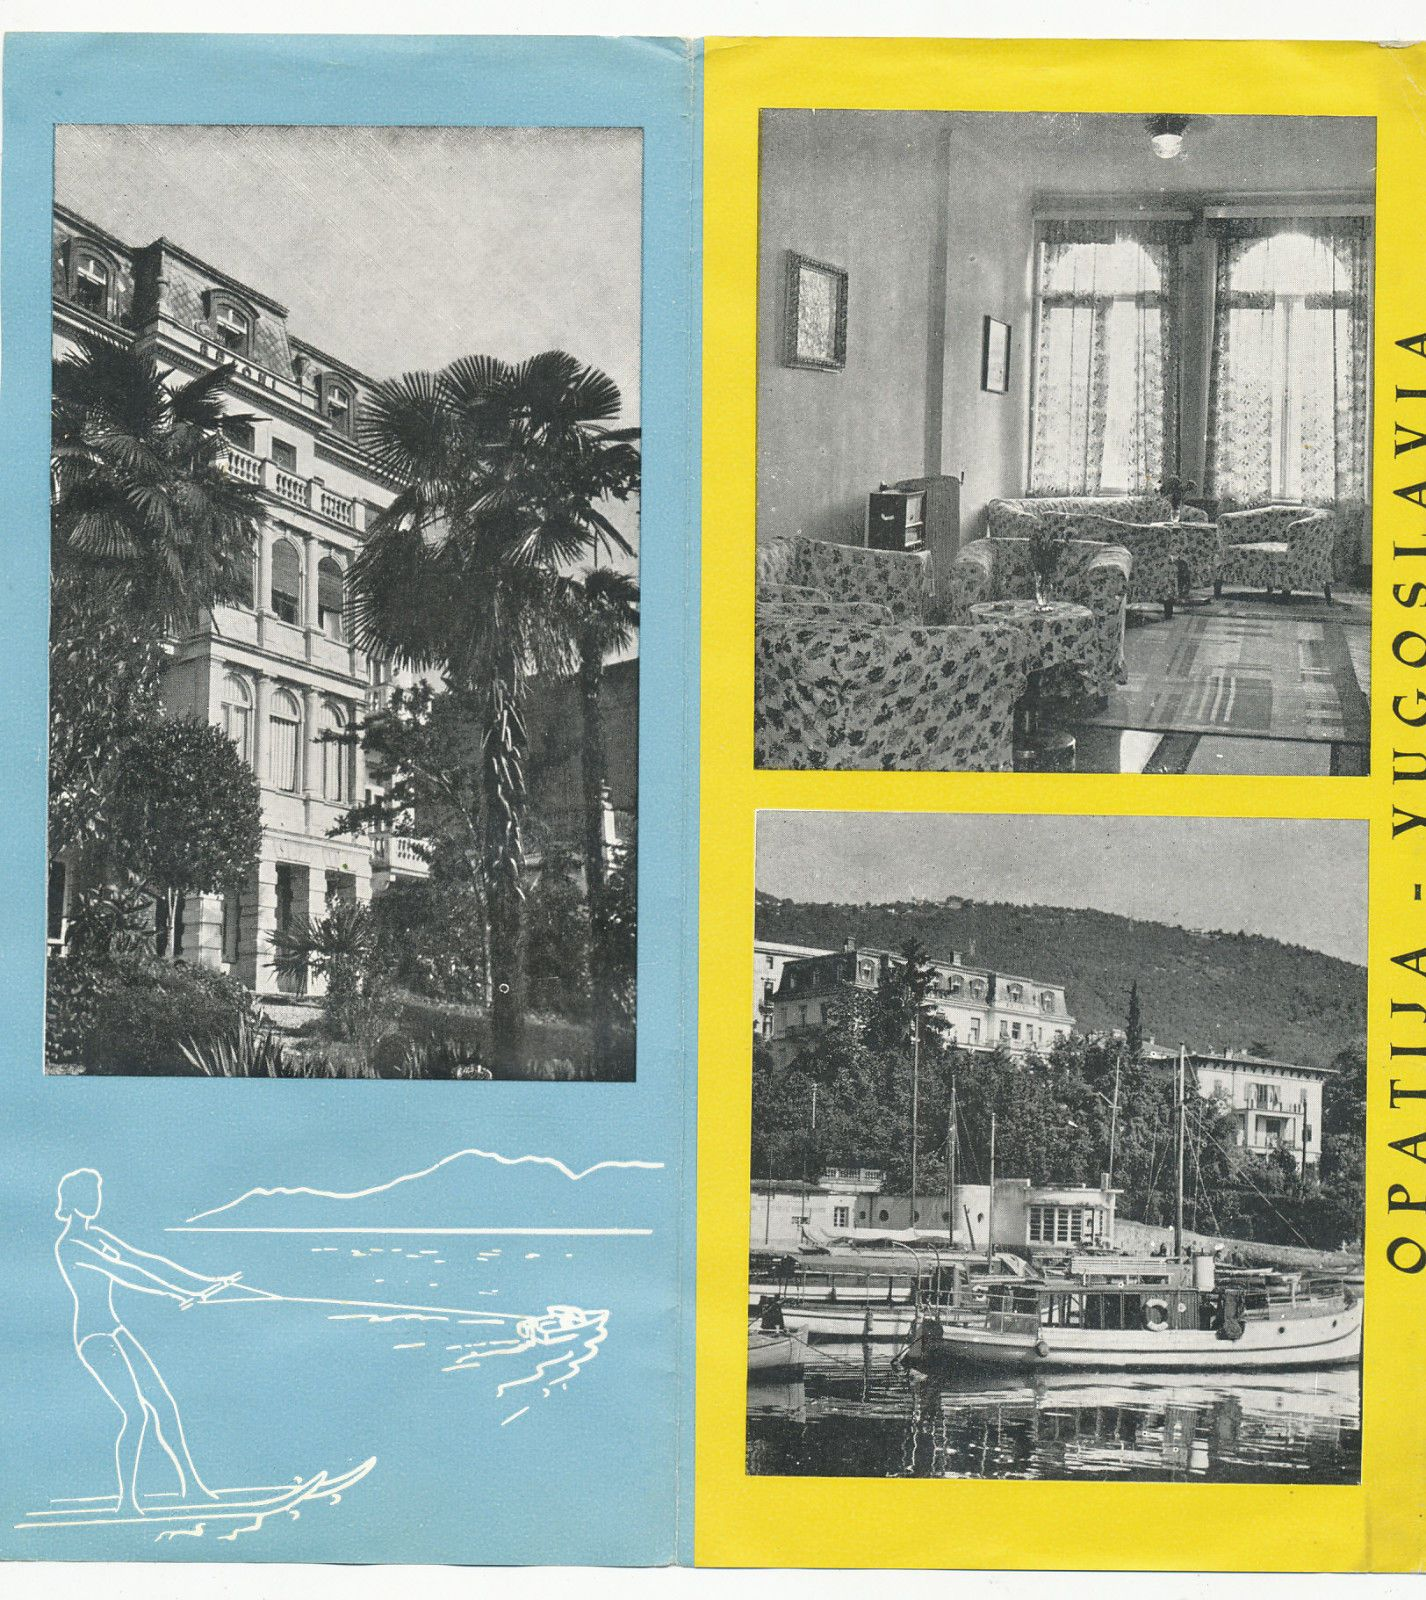 Hotel Brioni Miran Opatija Croatia Yugoslavia Vintage Brochure Prospect Vintage Old Pictures Croatia